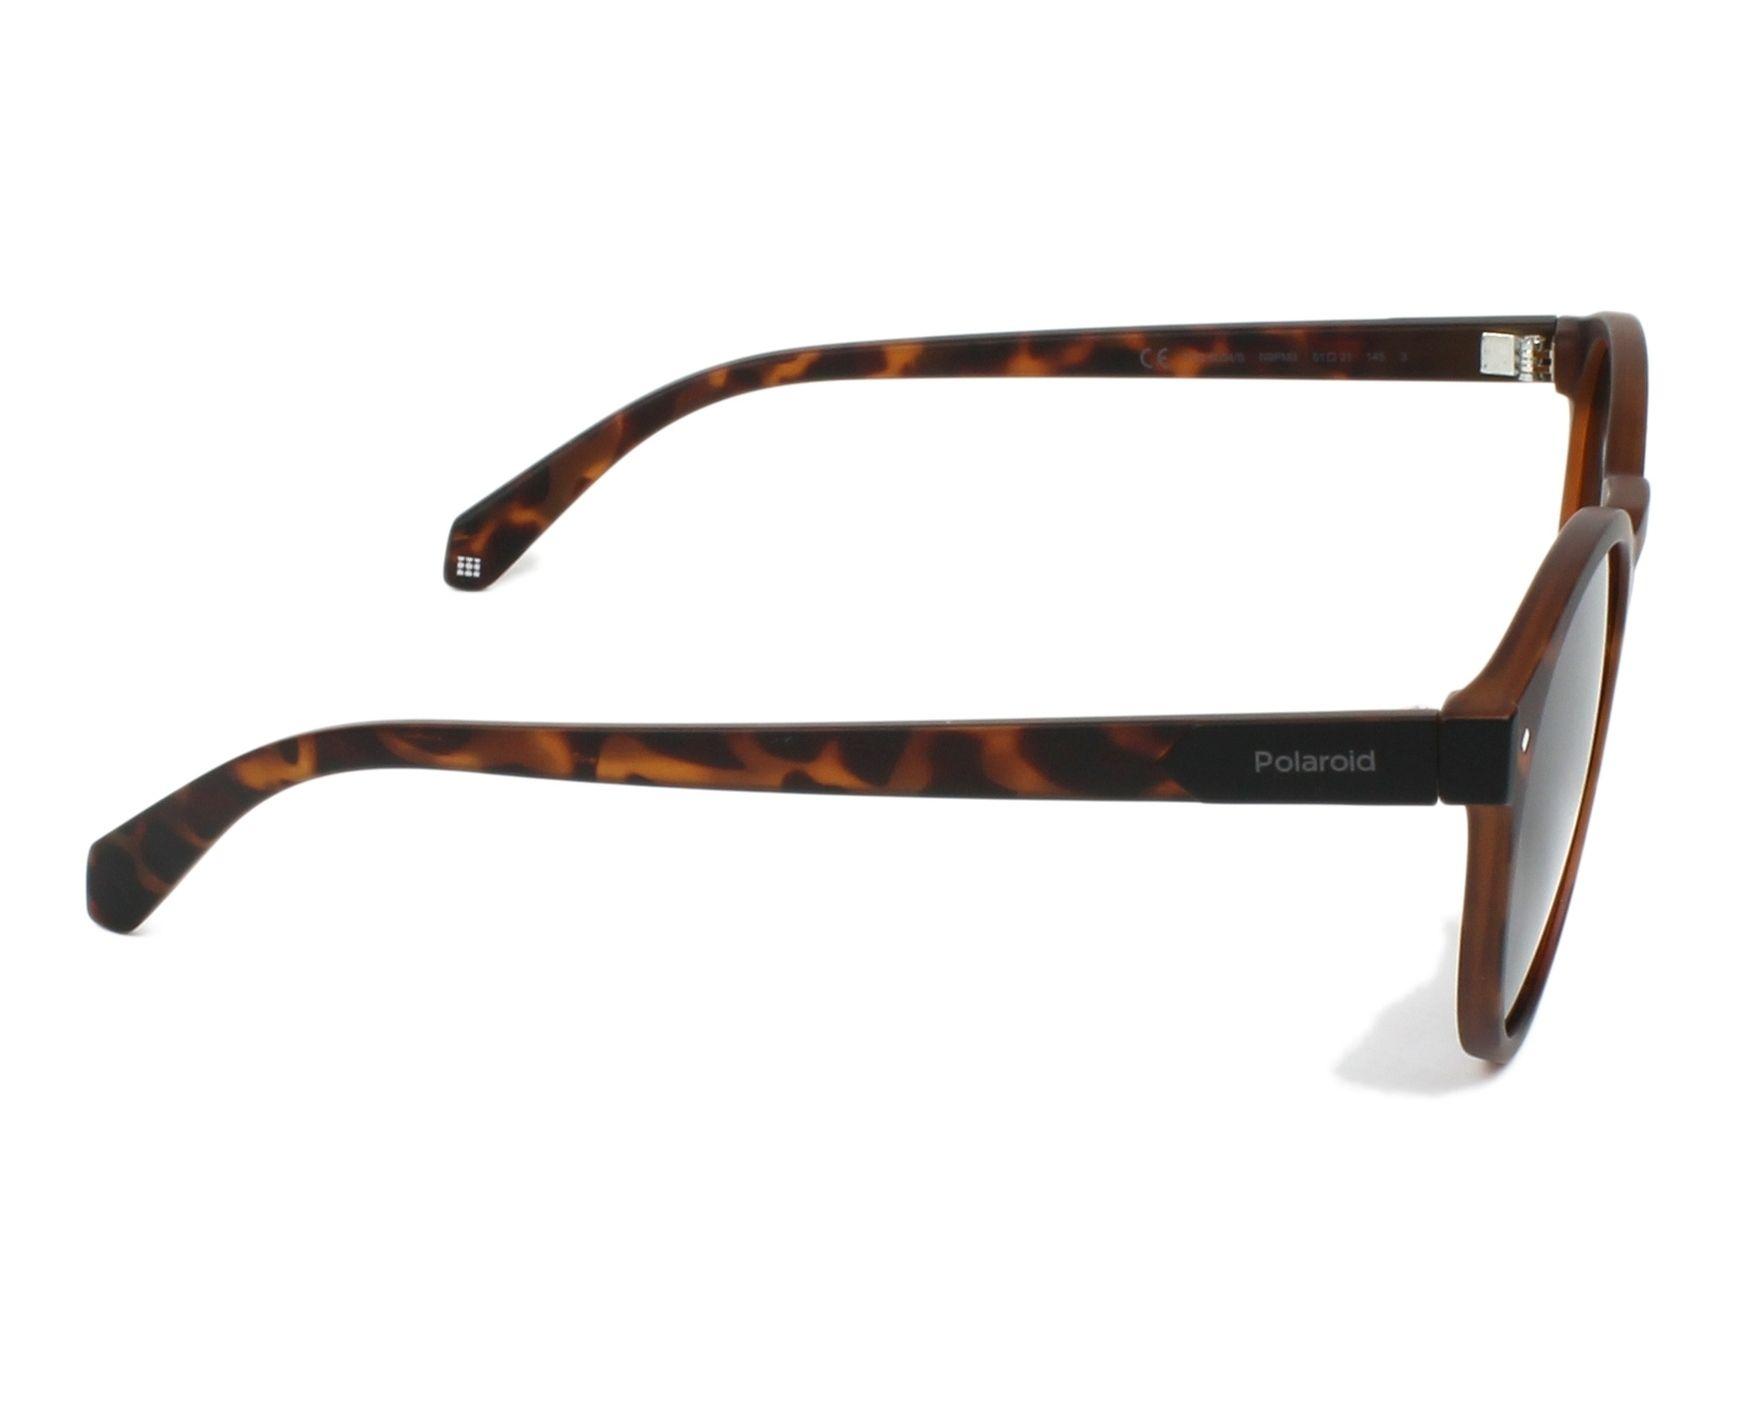 68b0d241103 Sunglasses Polaroid PLD-6034-S N9P M9 51-21 Havana side view